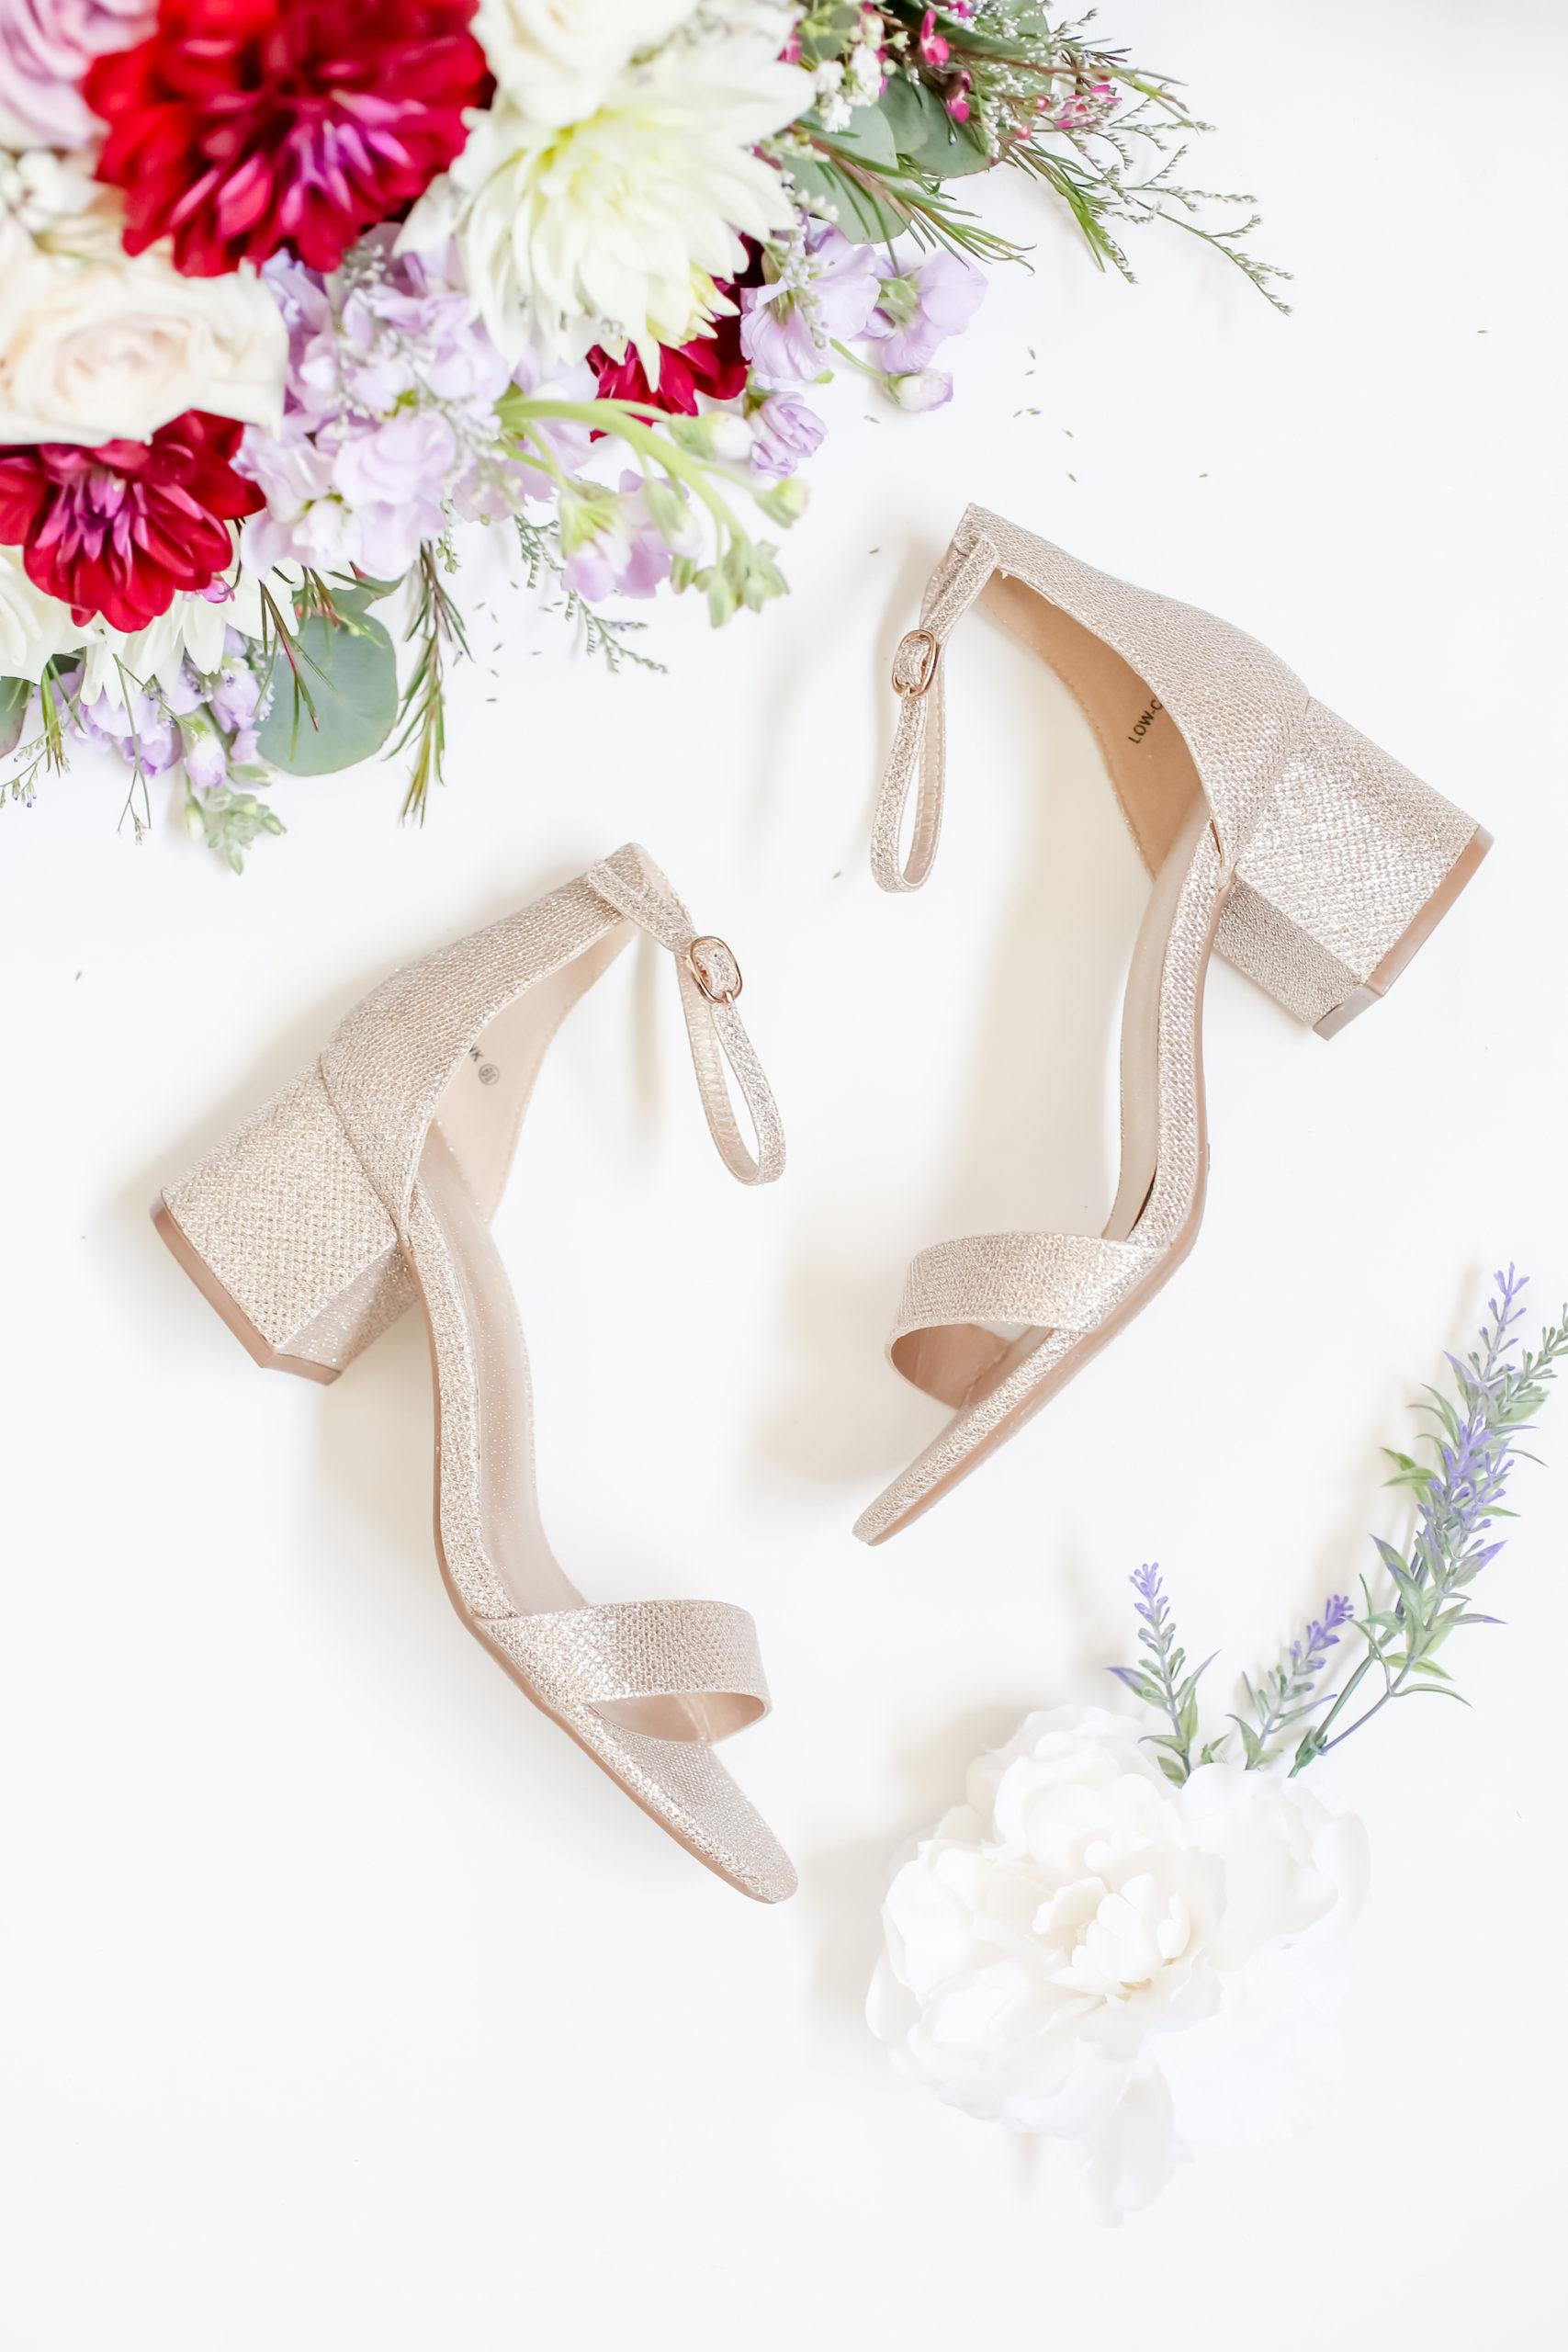 Bridal Detail Shot of Gold Sparkle Block Heel and Sandal Wedding Shoes   Florida Wedding Photographer Lifelong Photography Studio